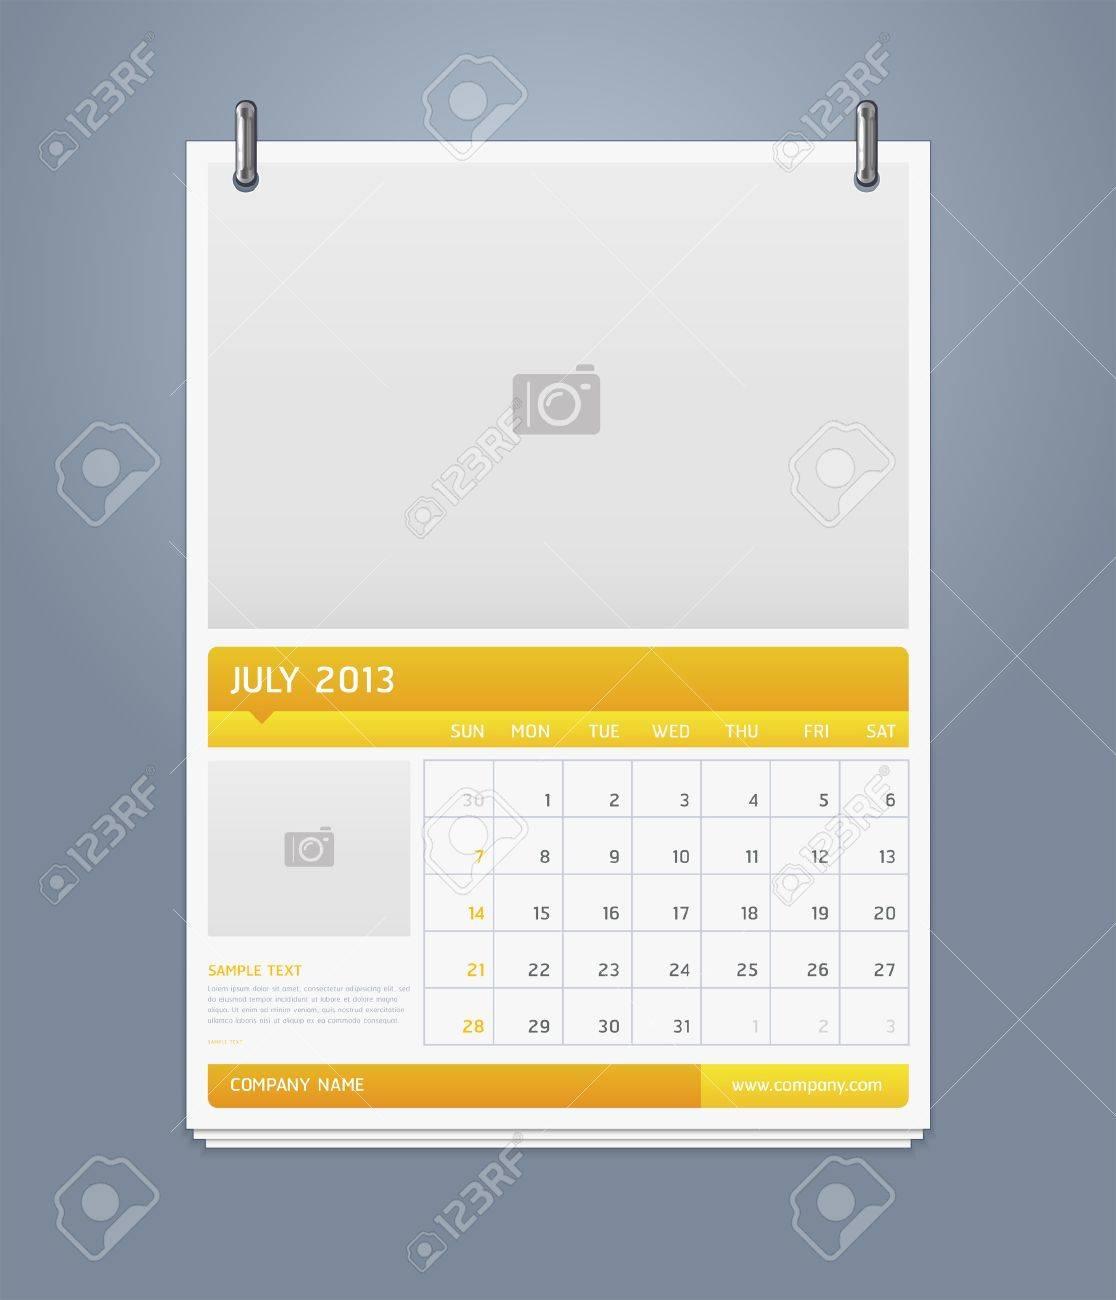 Clean calendar 2013 template design  Vector illustration Stock Vector - 16560128